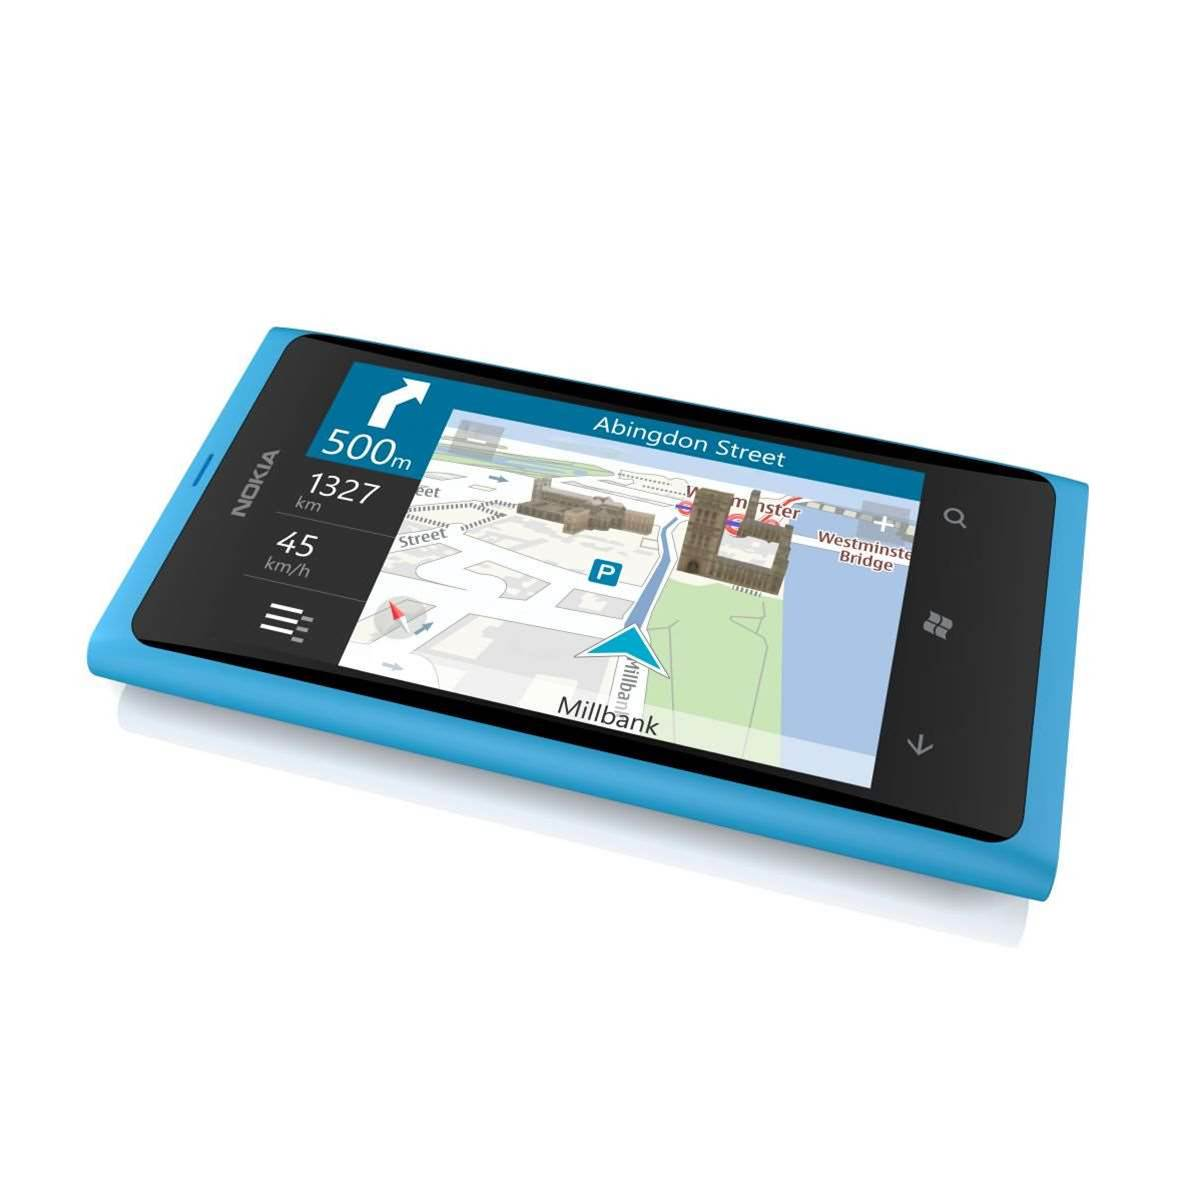 Photos: Nokia's first Windows smartphones